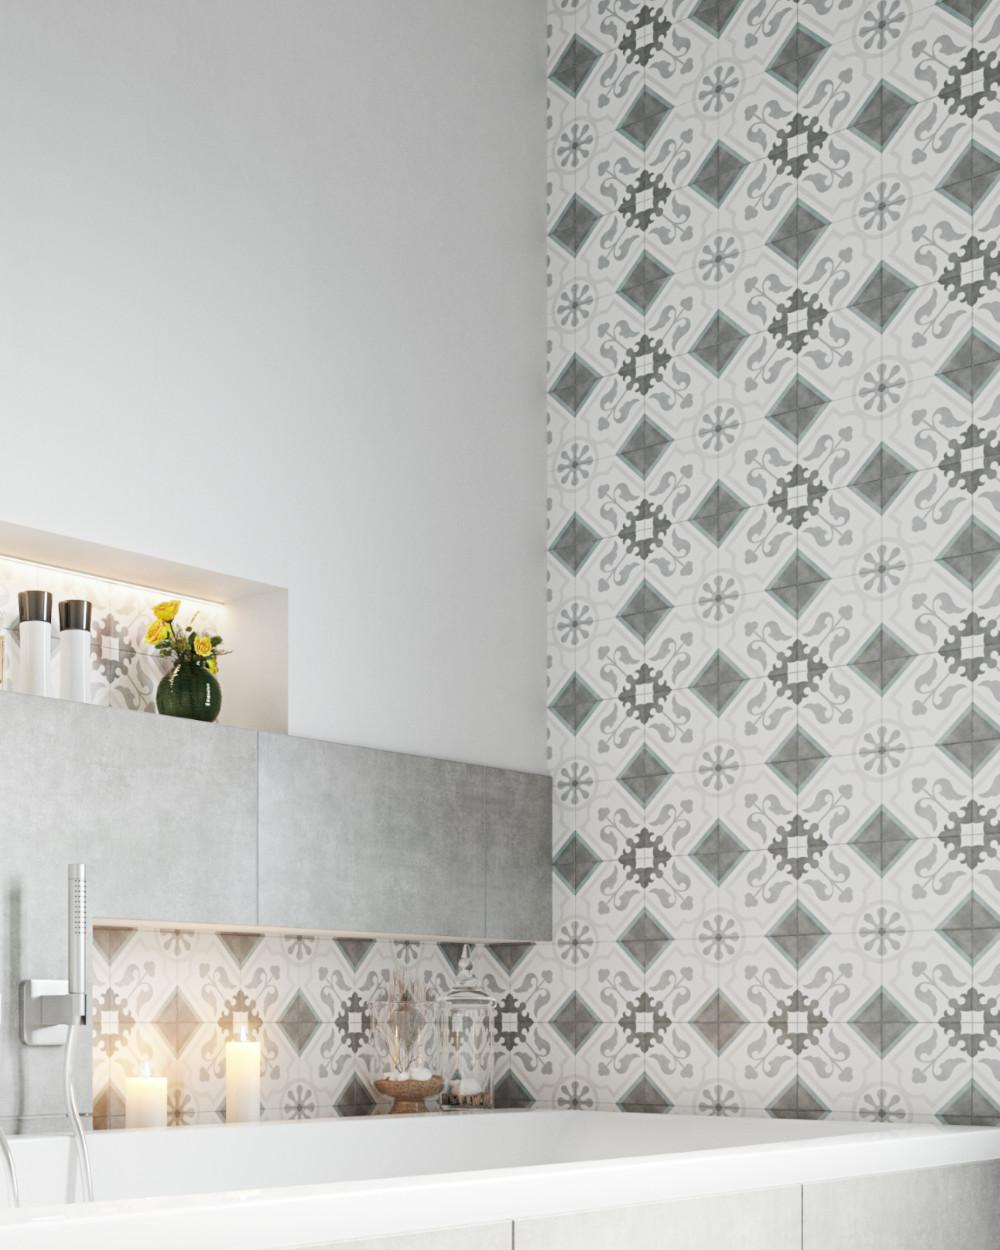 frame15 decor chic arrow 15x15 cm tiles for floor and wall tiles online shop